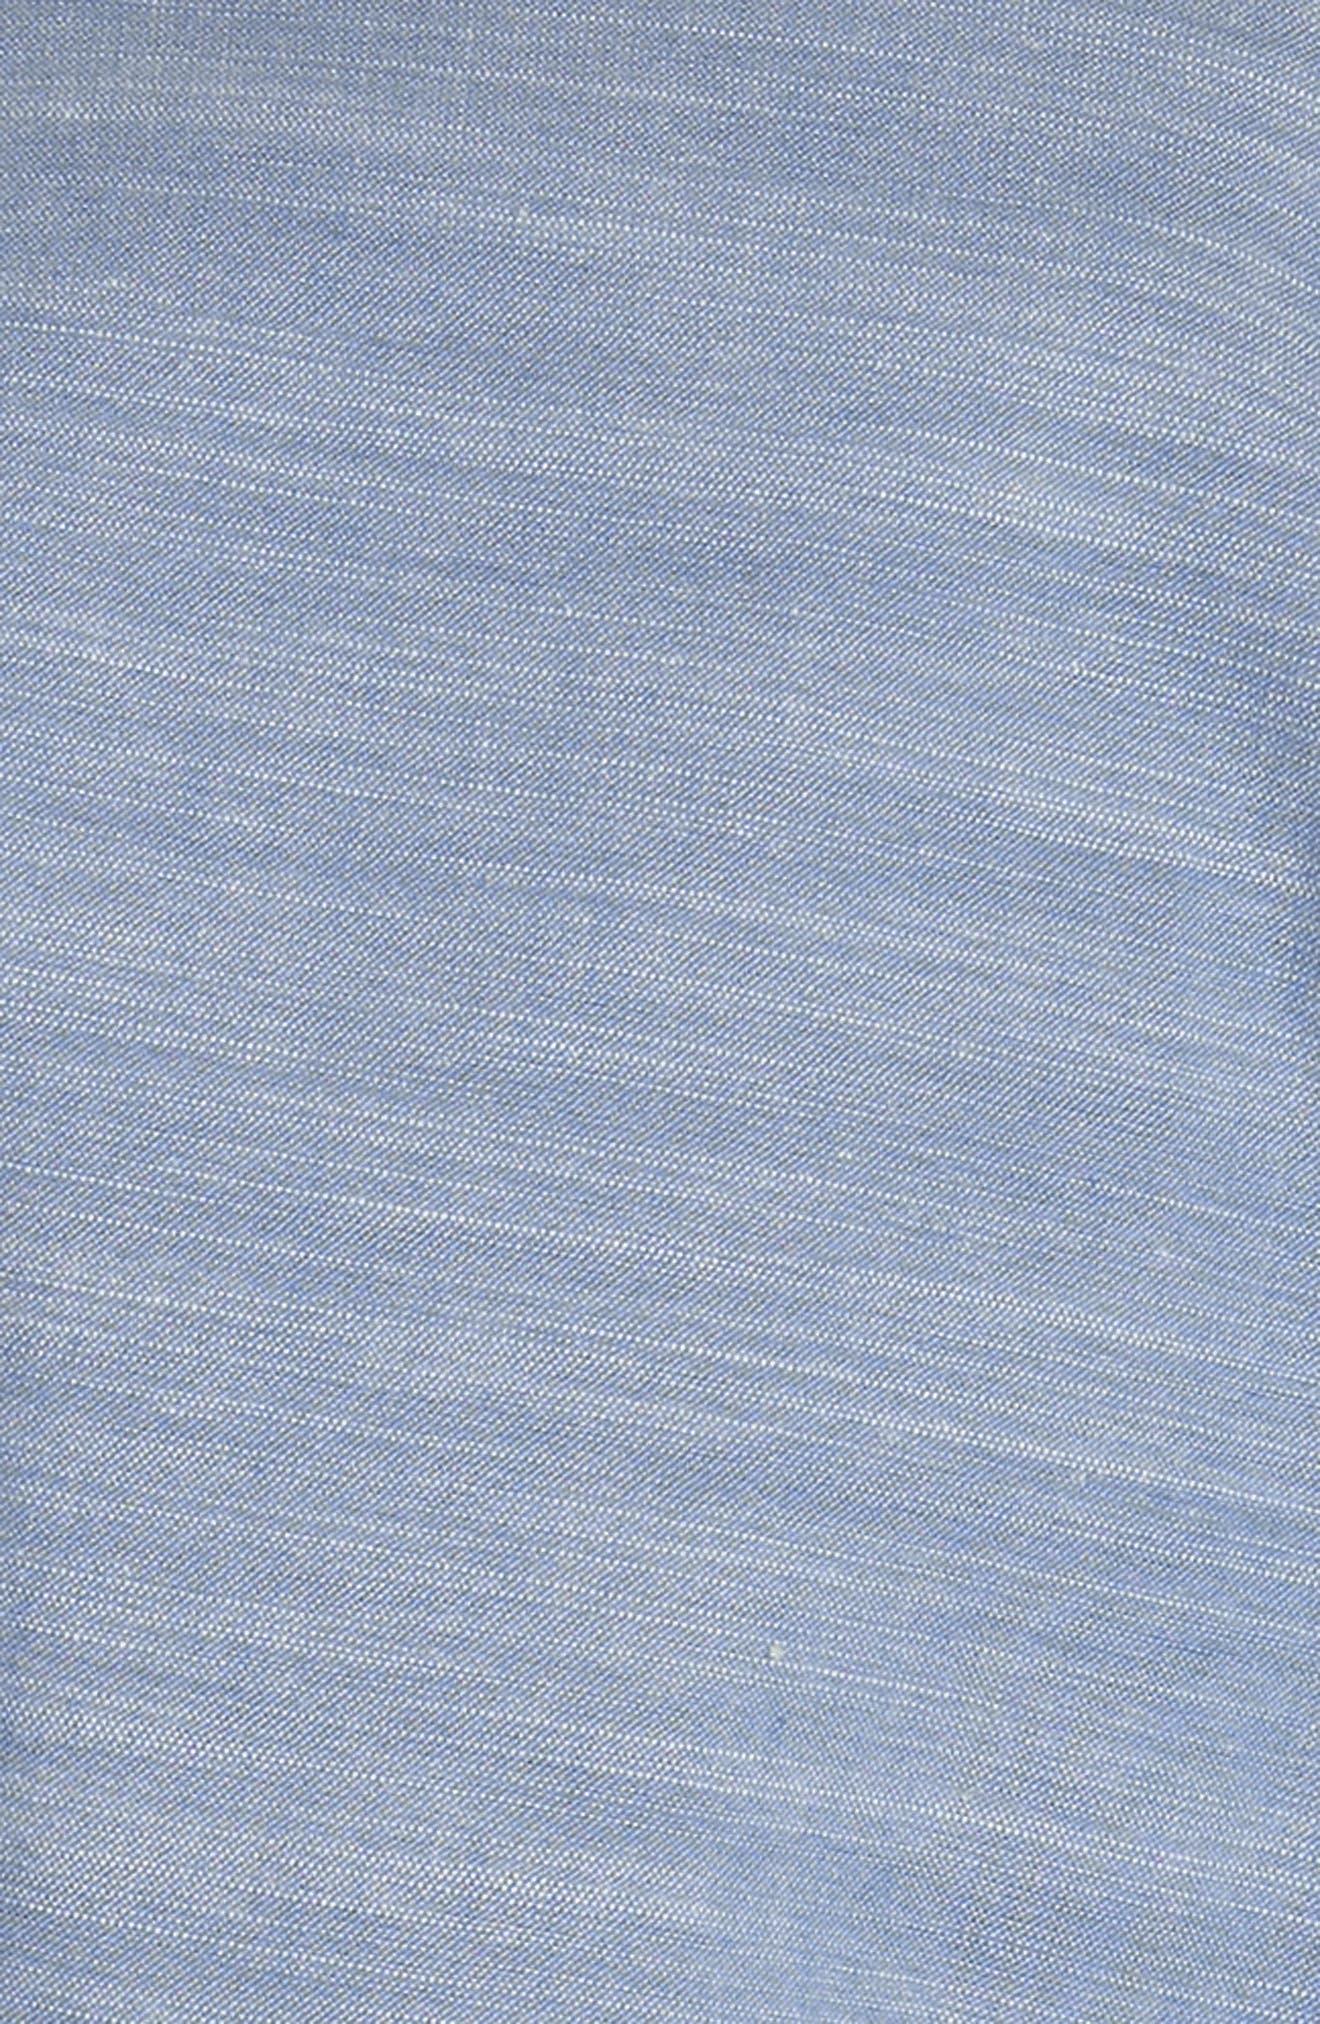 Ecidra Drawstring Waist Chambray Dress,                             Alternate thumbnail 6, color,                             CHAMBRAY PORCELAIN